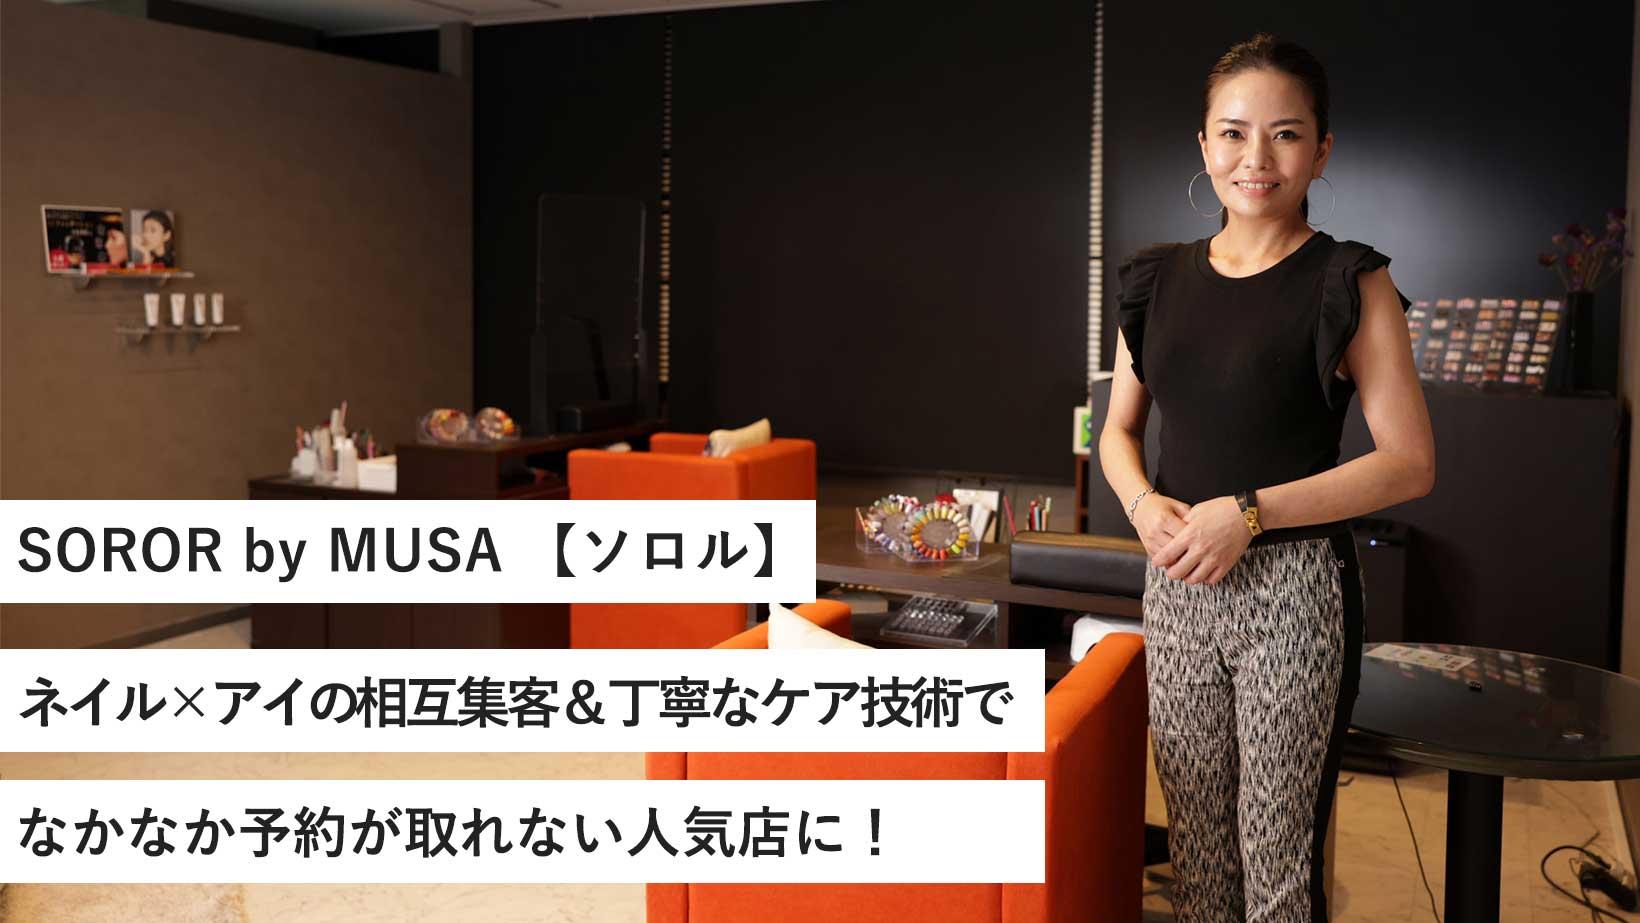 SOROR by MUSA 【ソロル】ネイル×アイの相互集客&ケア技術で予約が取れない人気店に!